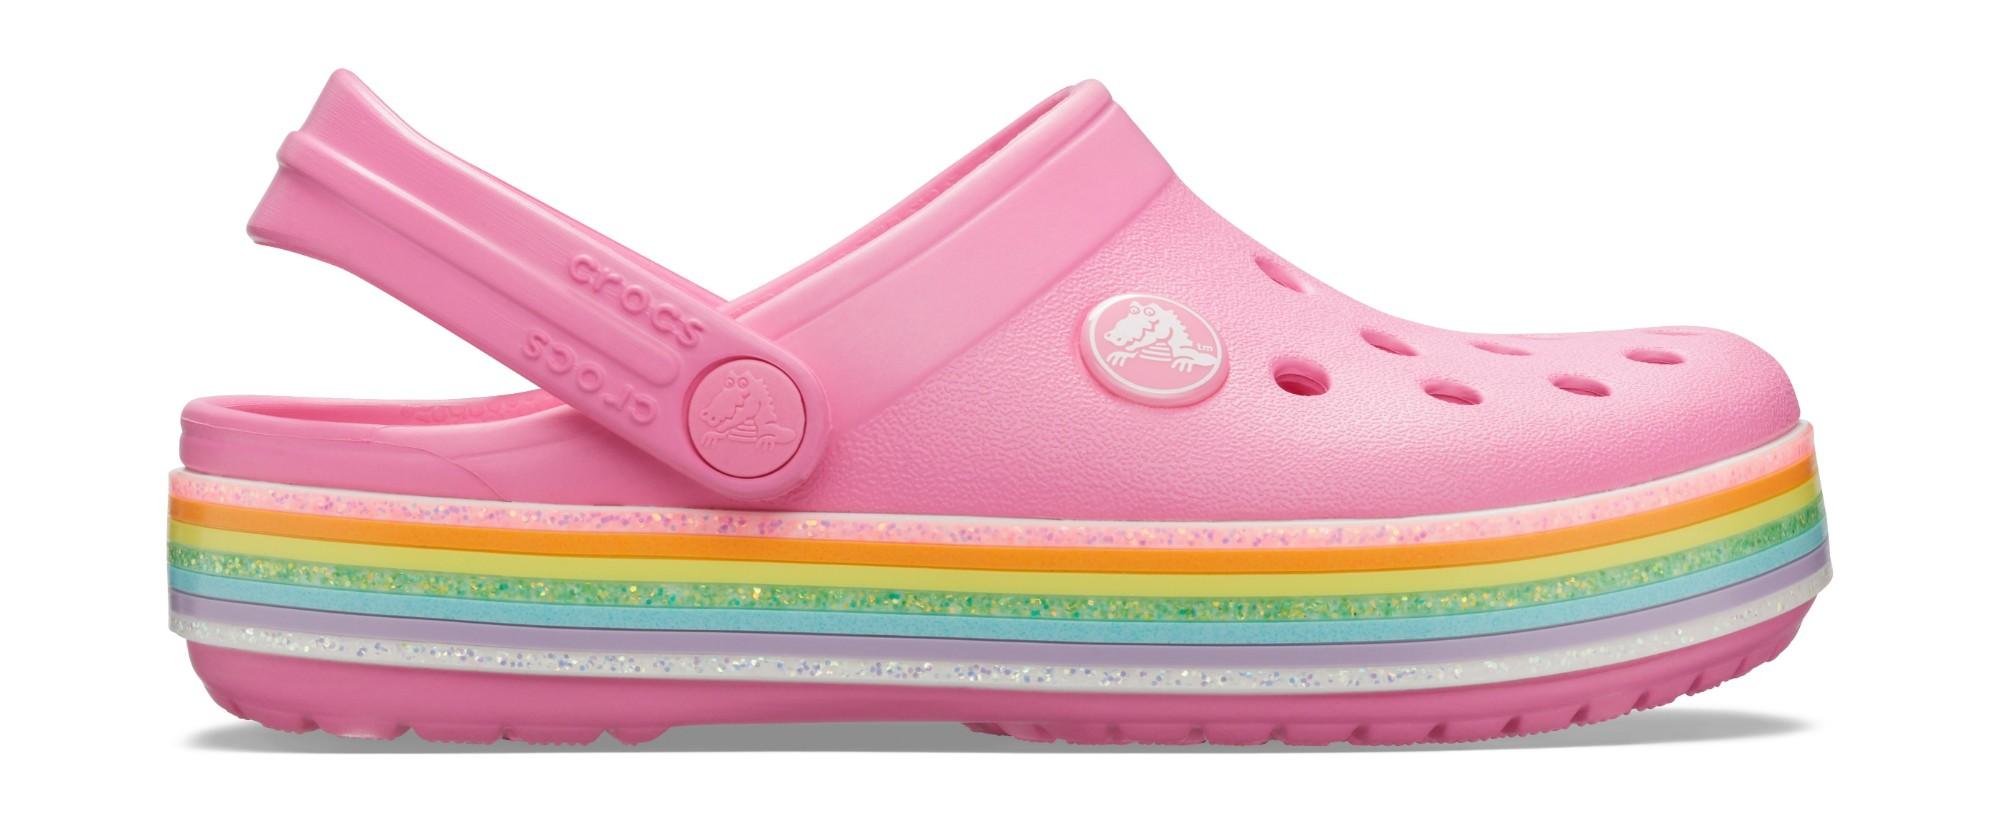 Crocs™ Crocband Rainbow Glitter Clog Kids Pink Lemonade 24